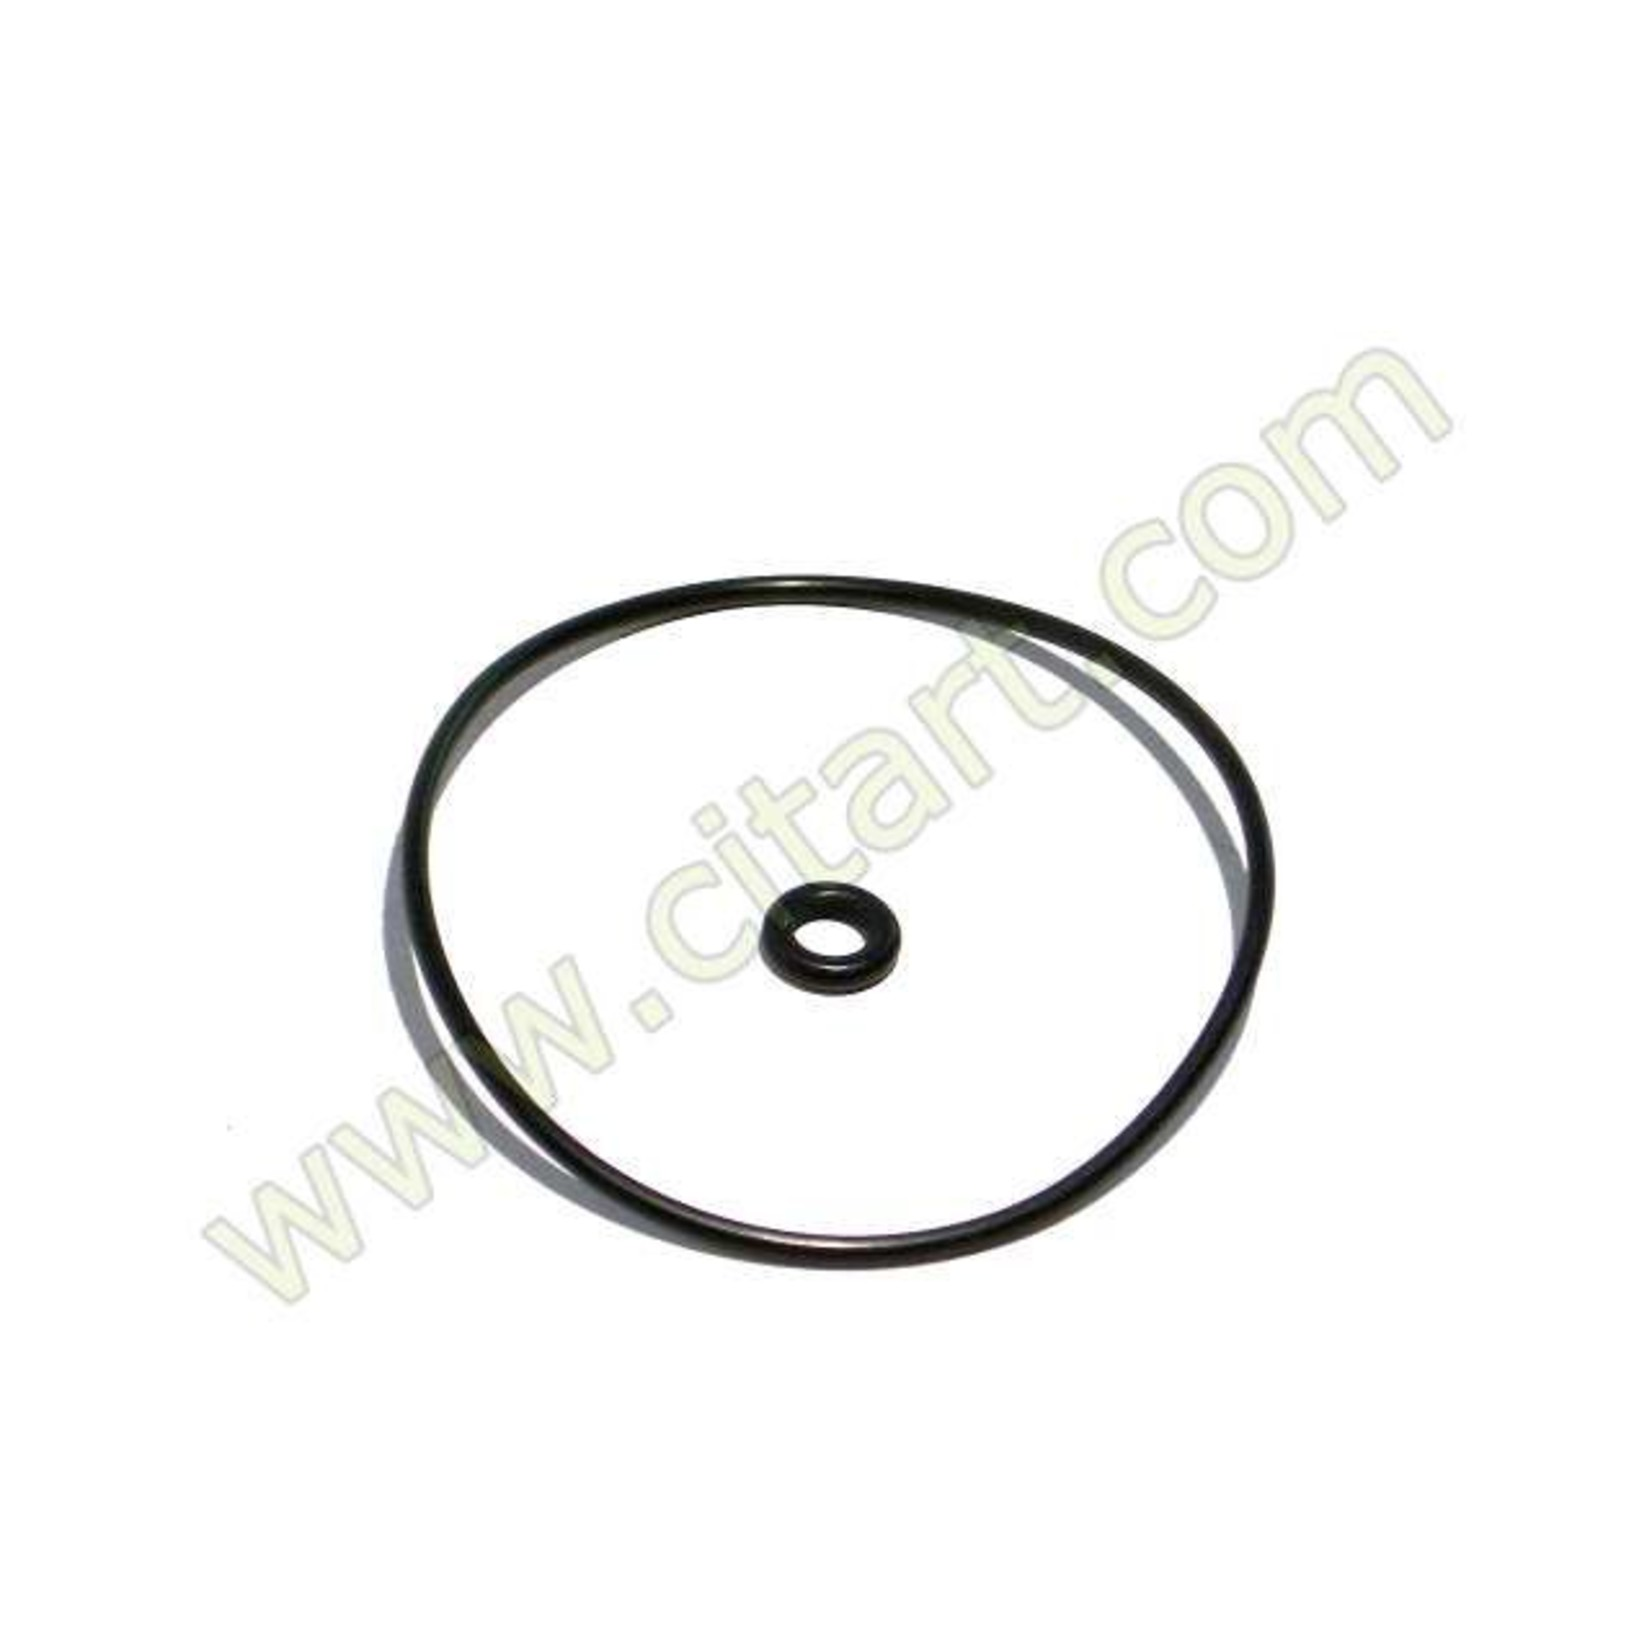 Sealing ring oil filter small Nr Org: 24941009